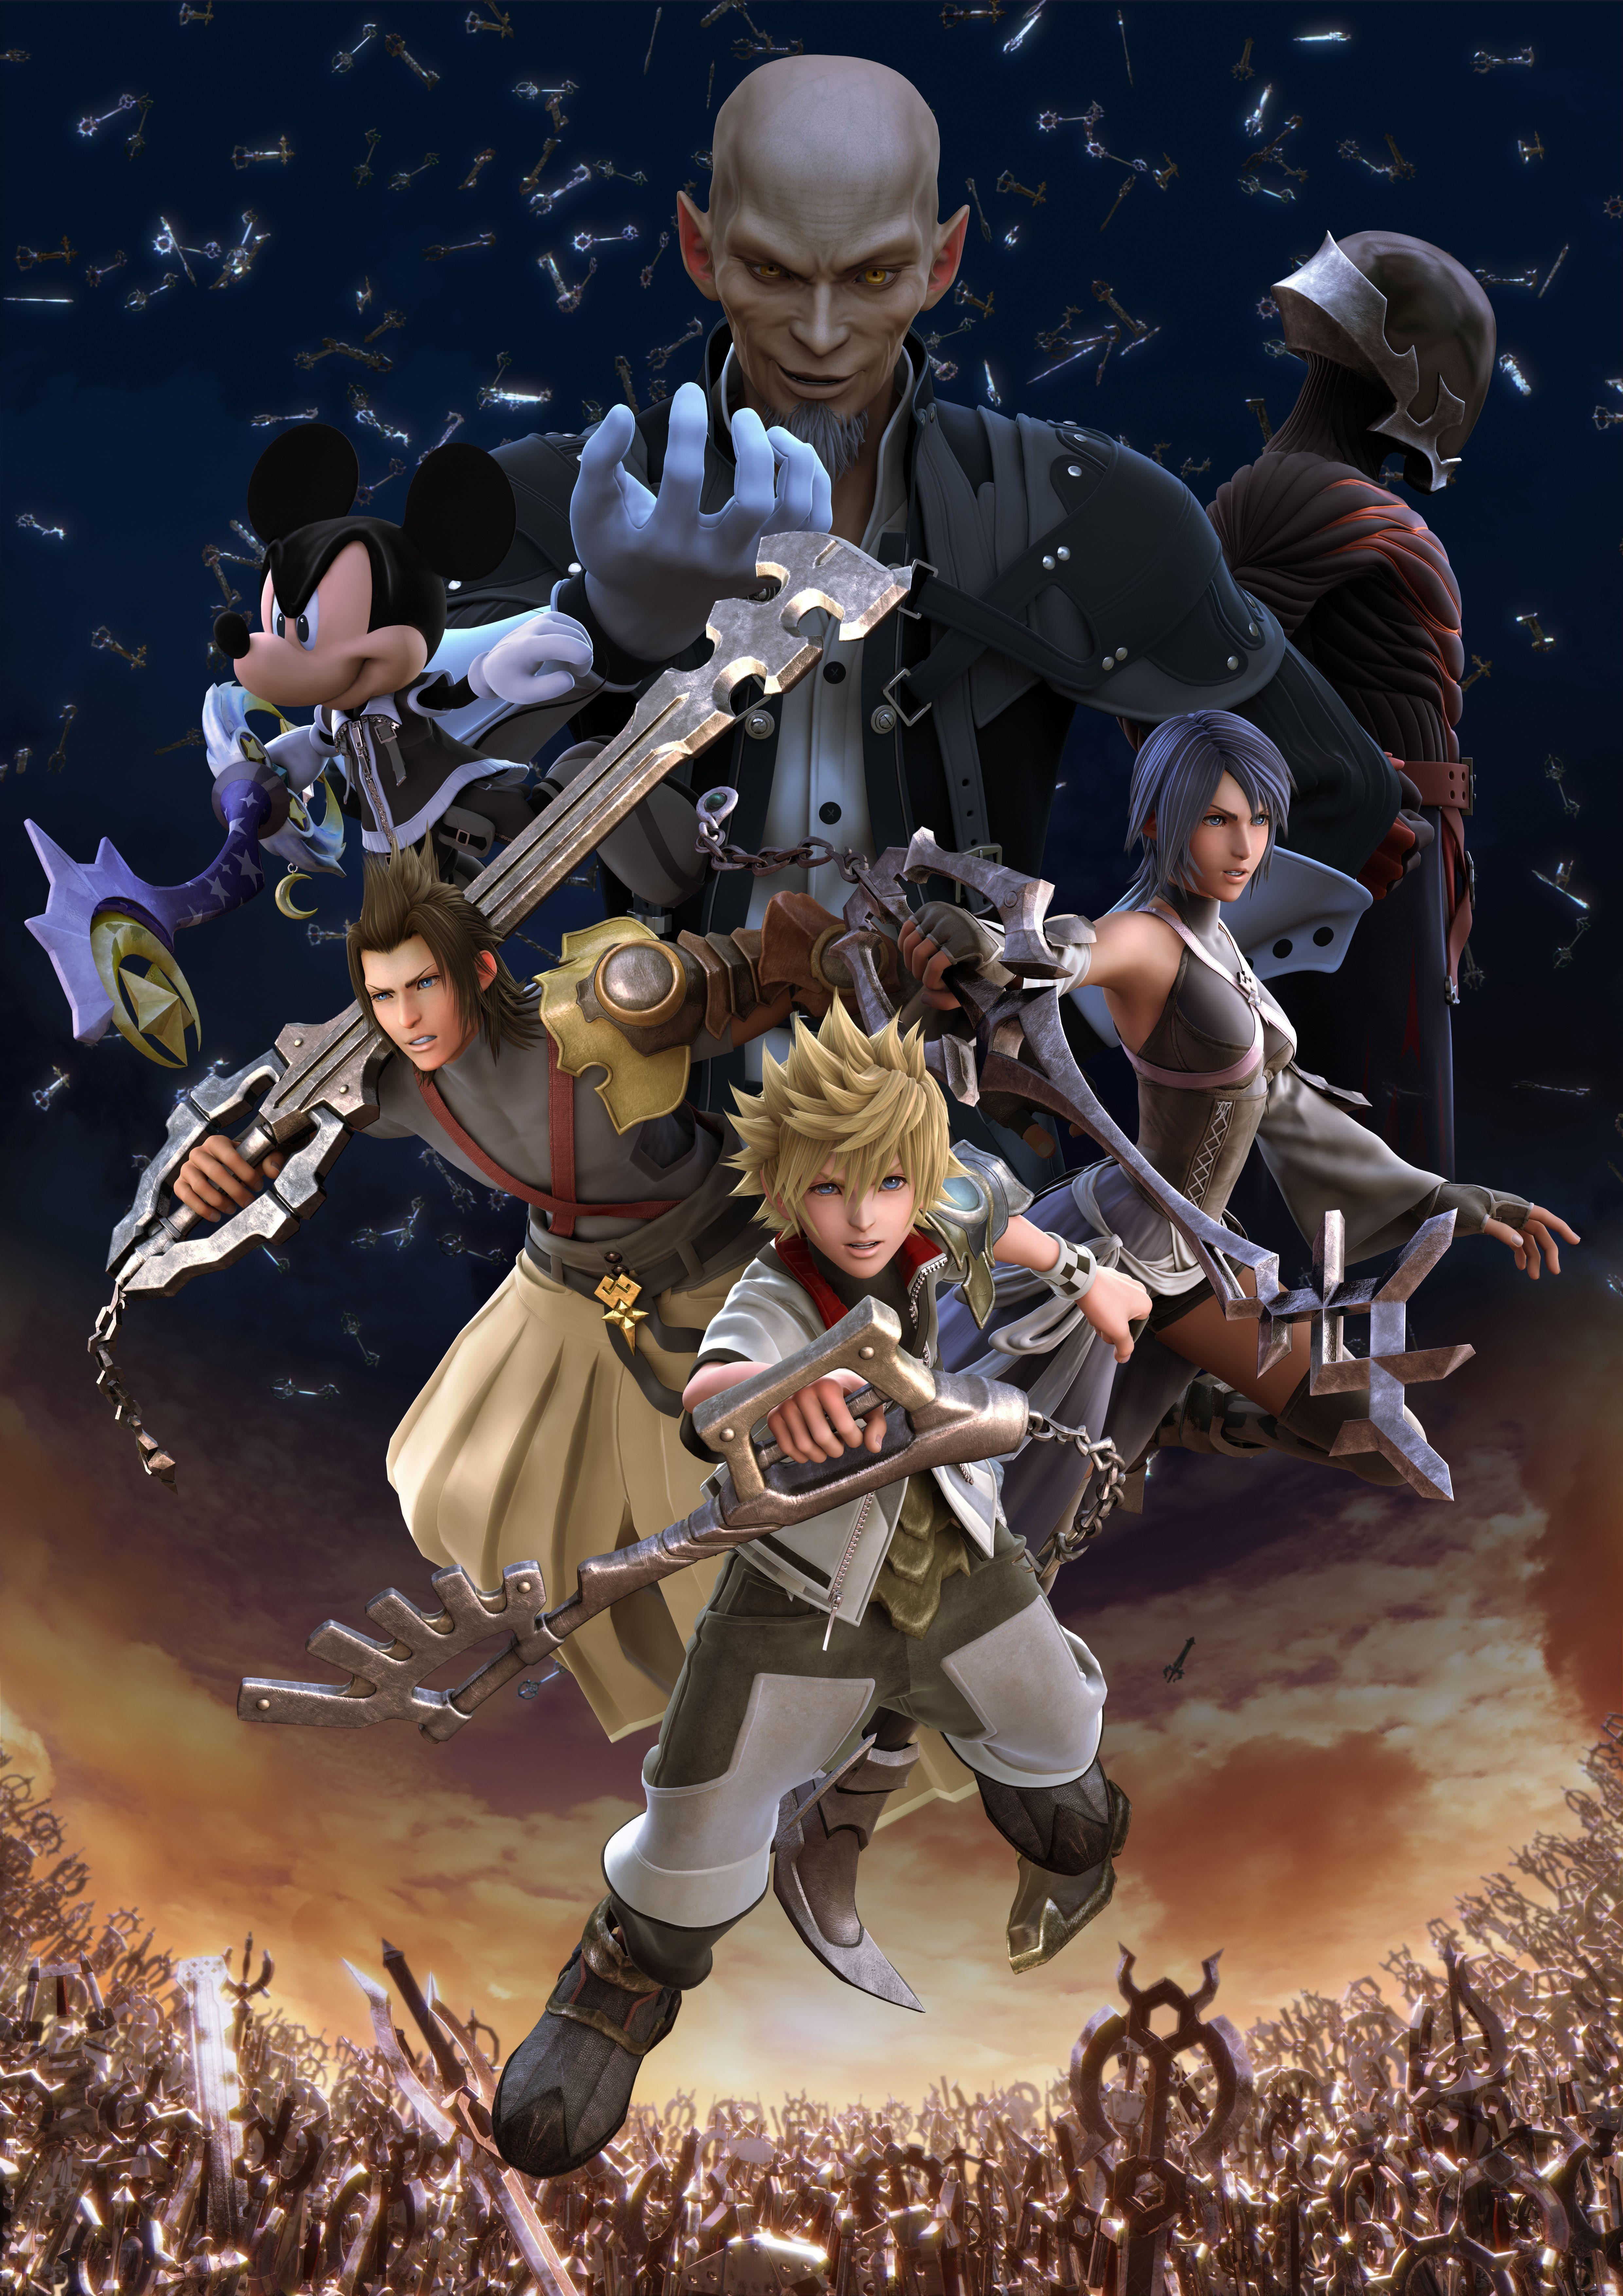 Kingdom Hearts Birth By Sleep Wallpapers Top Free Kingdom Hearts Birth By Sleep Backgrounds Wallpaperaccess